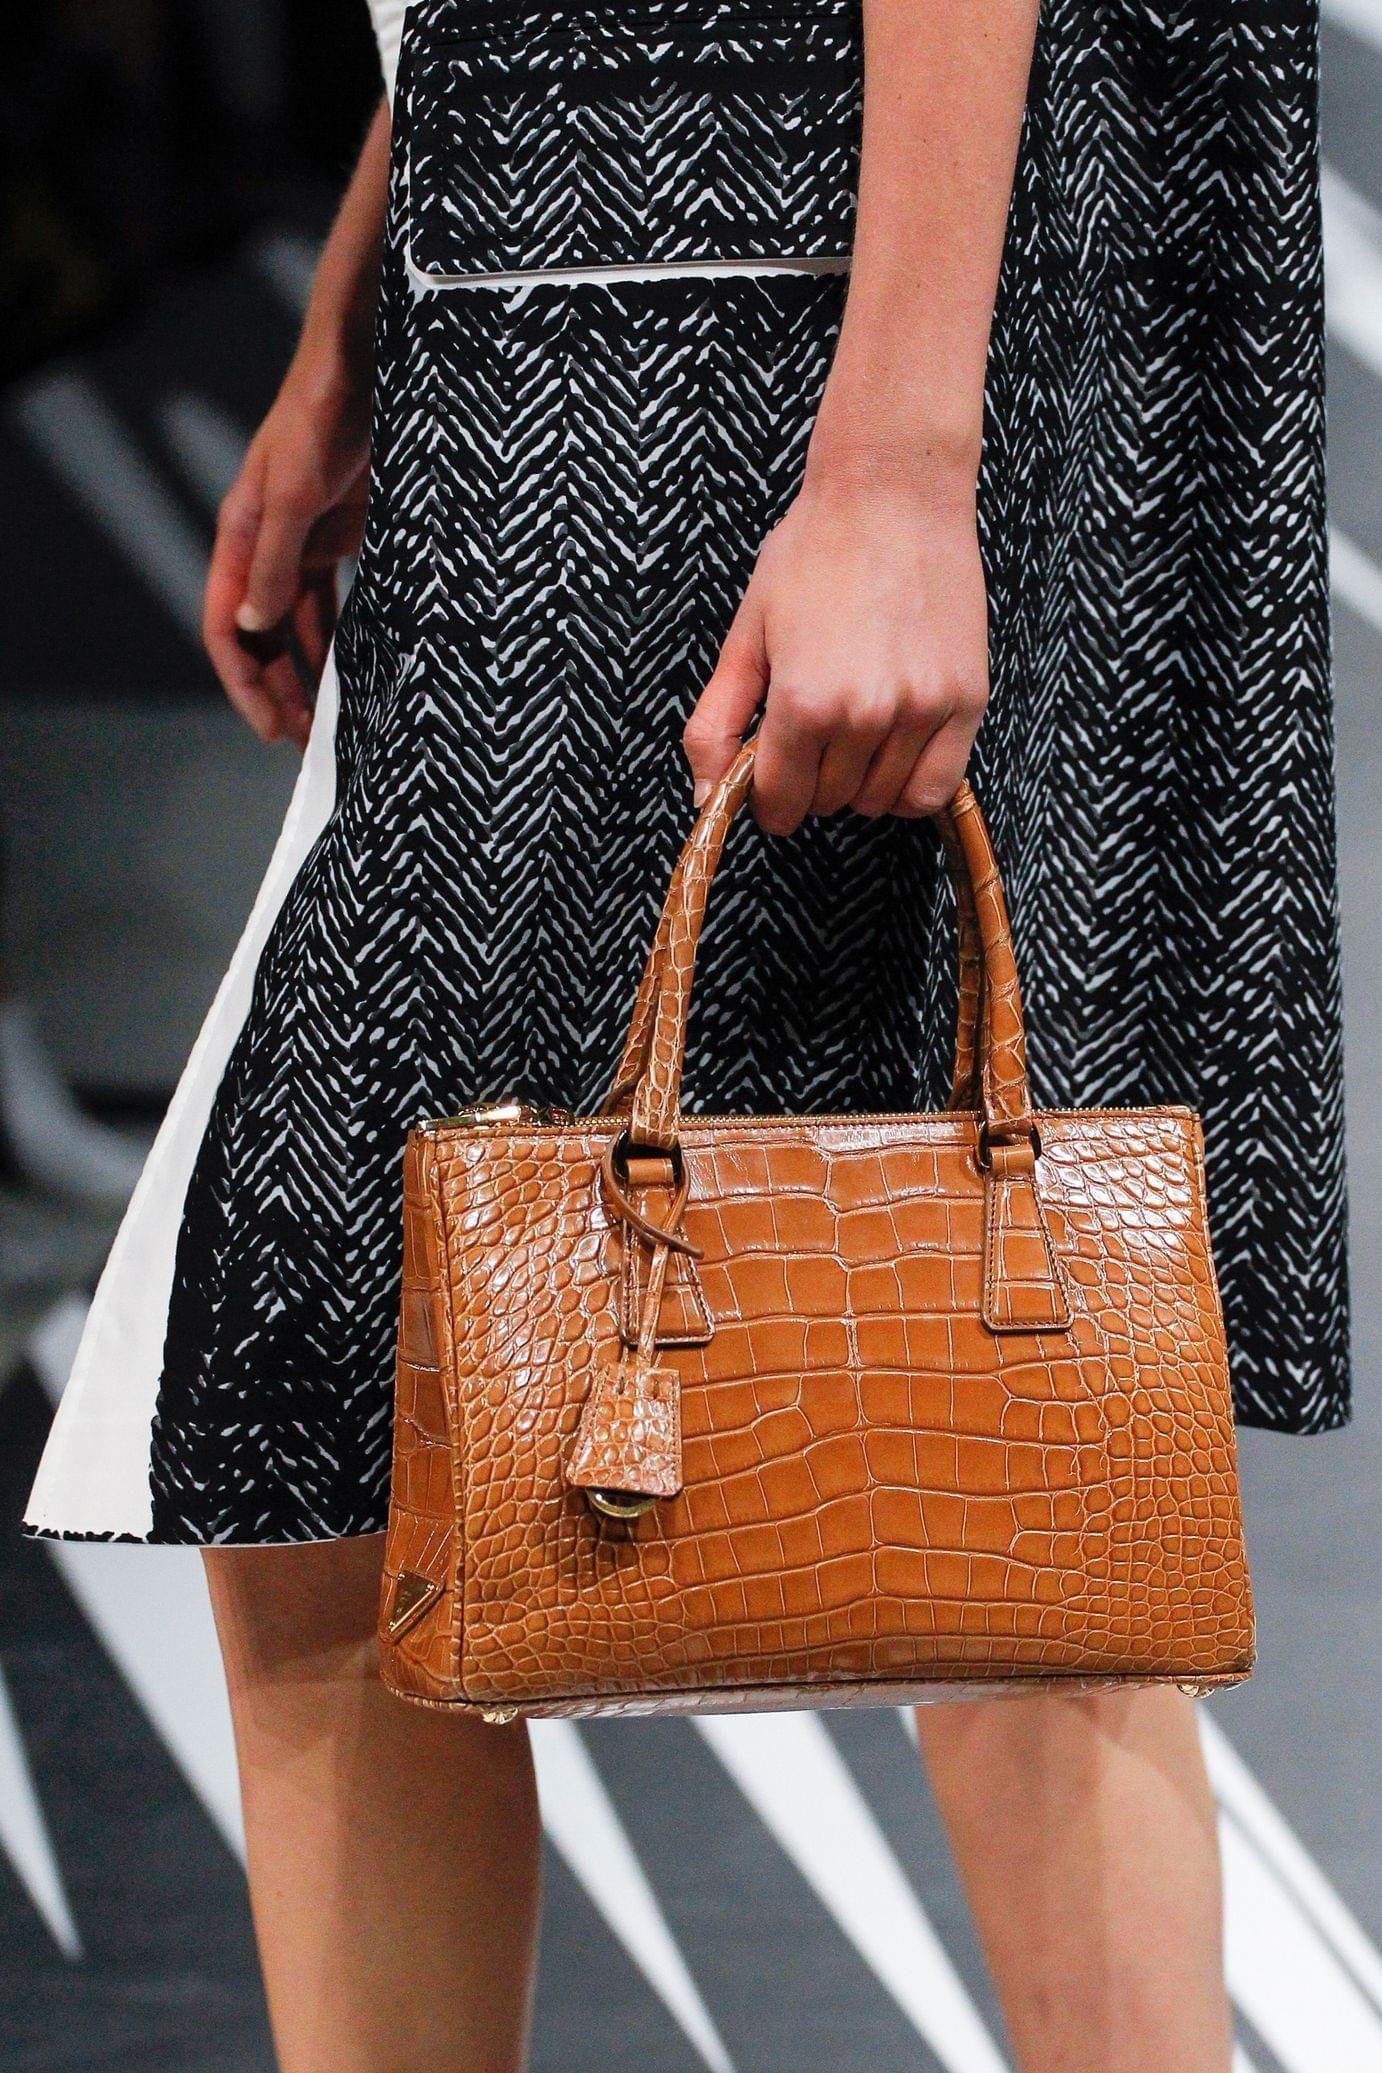 Prada весна лето 2018 коричневая сумка под крокодила